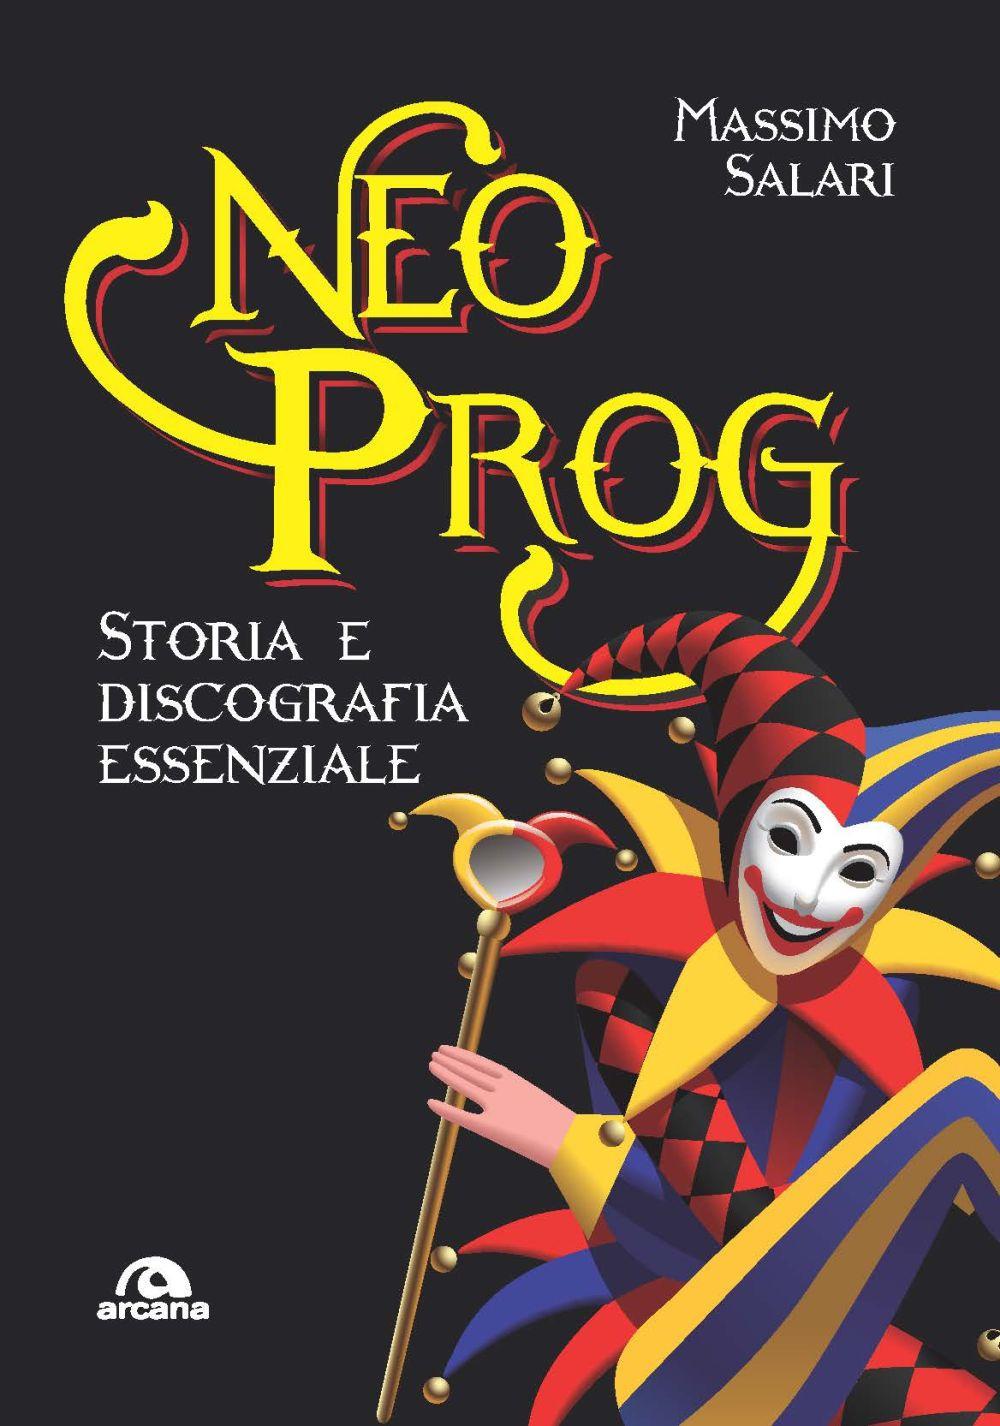 NEO PROG. STORIA E DISCOGRAFIA - Salari Massimo - 9788862319744